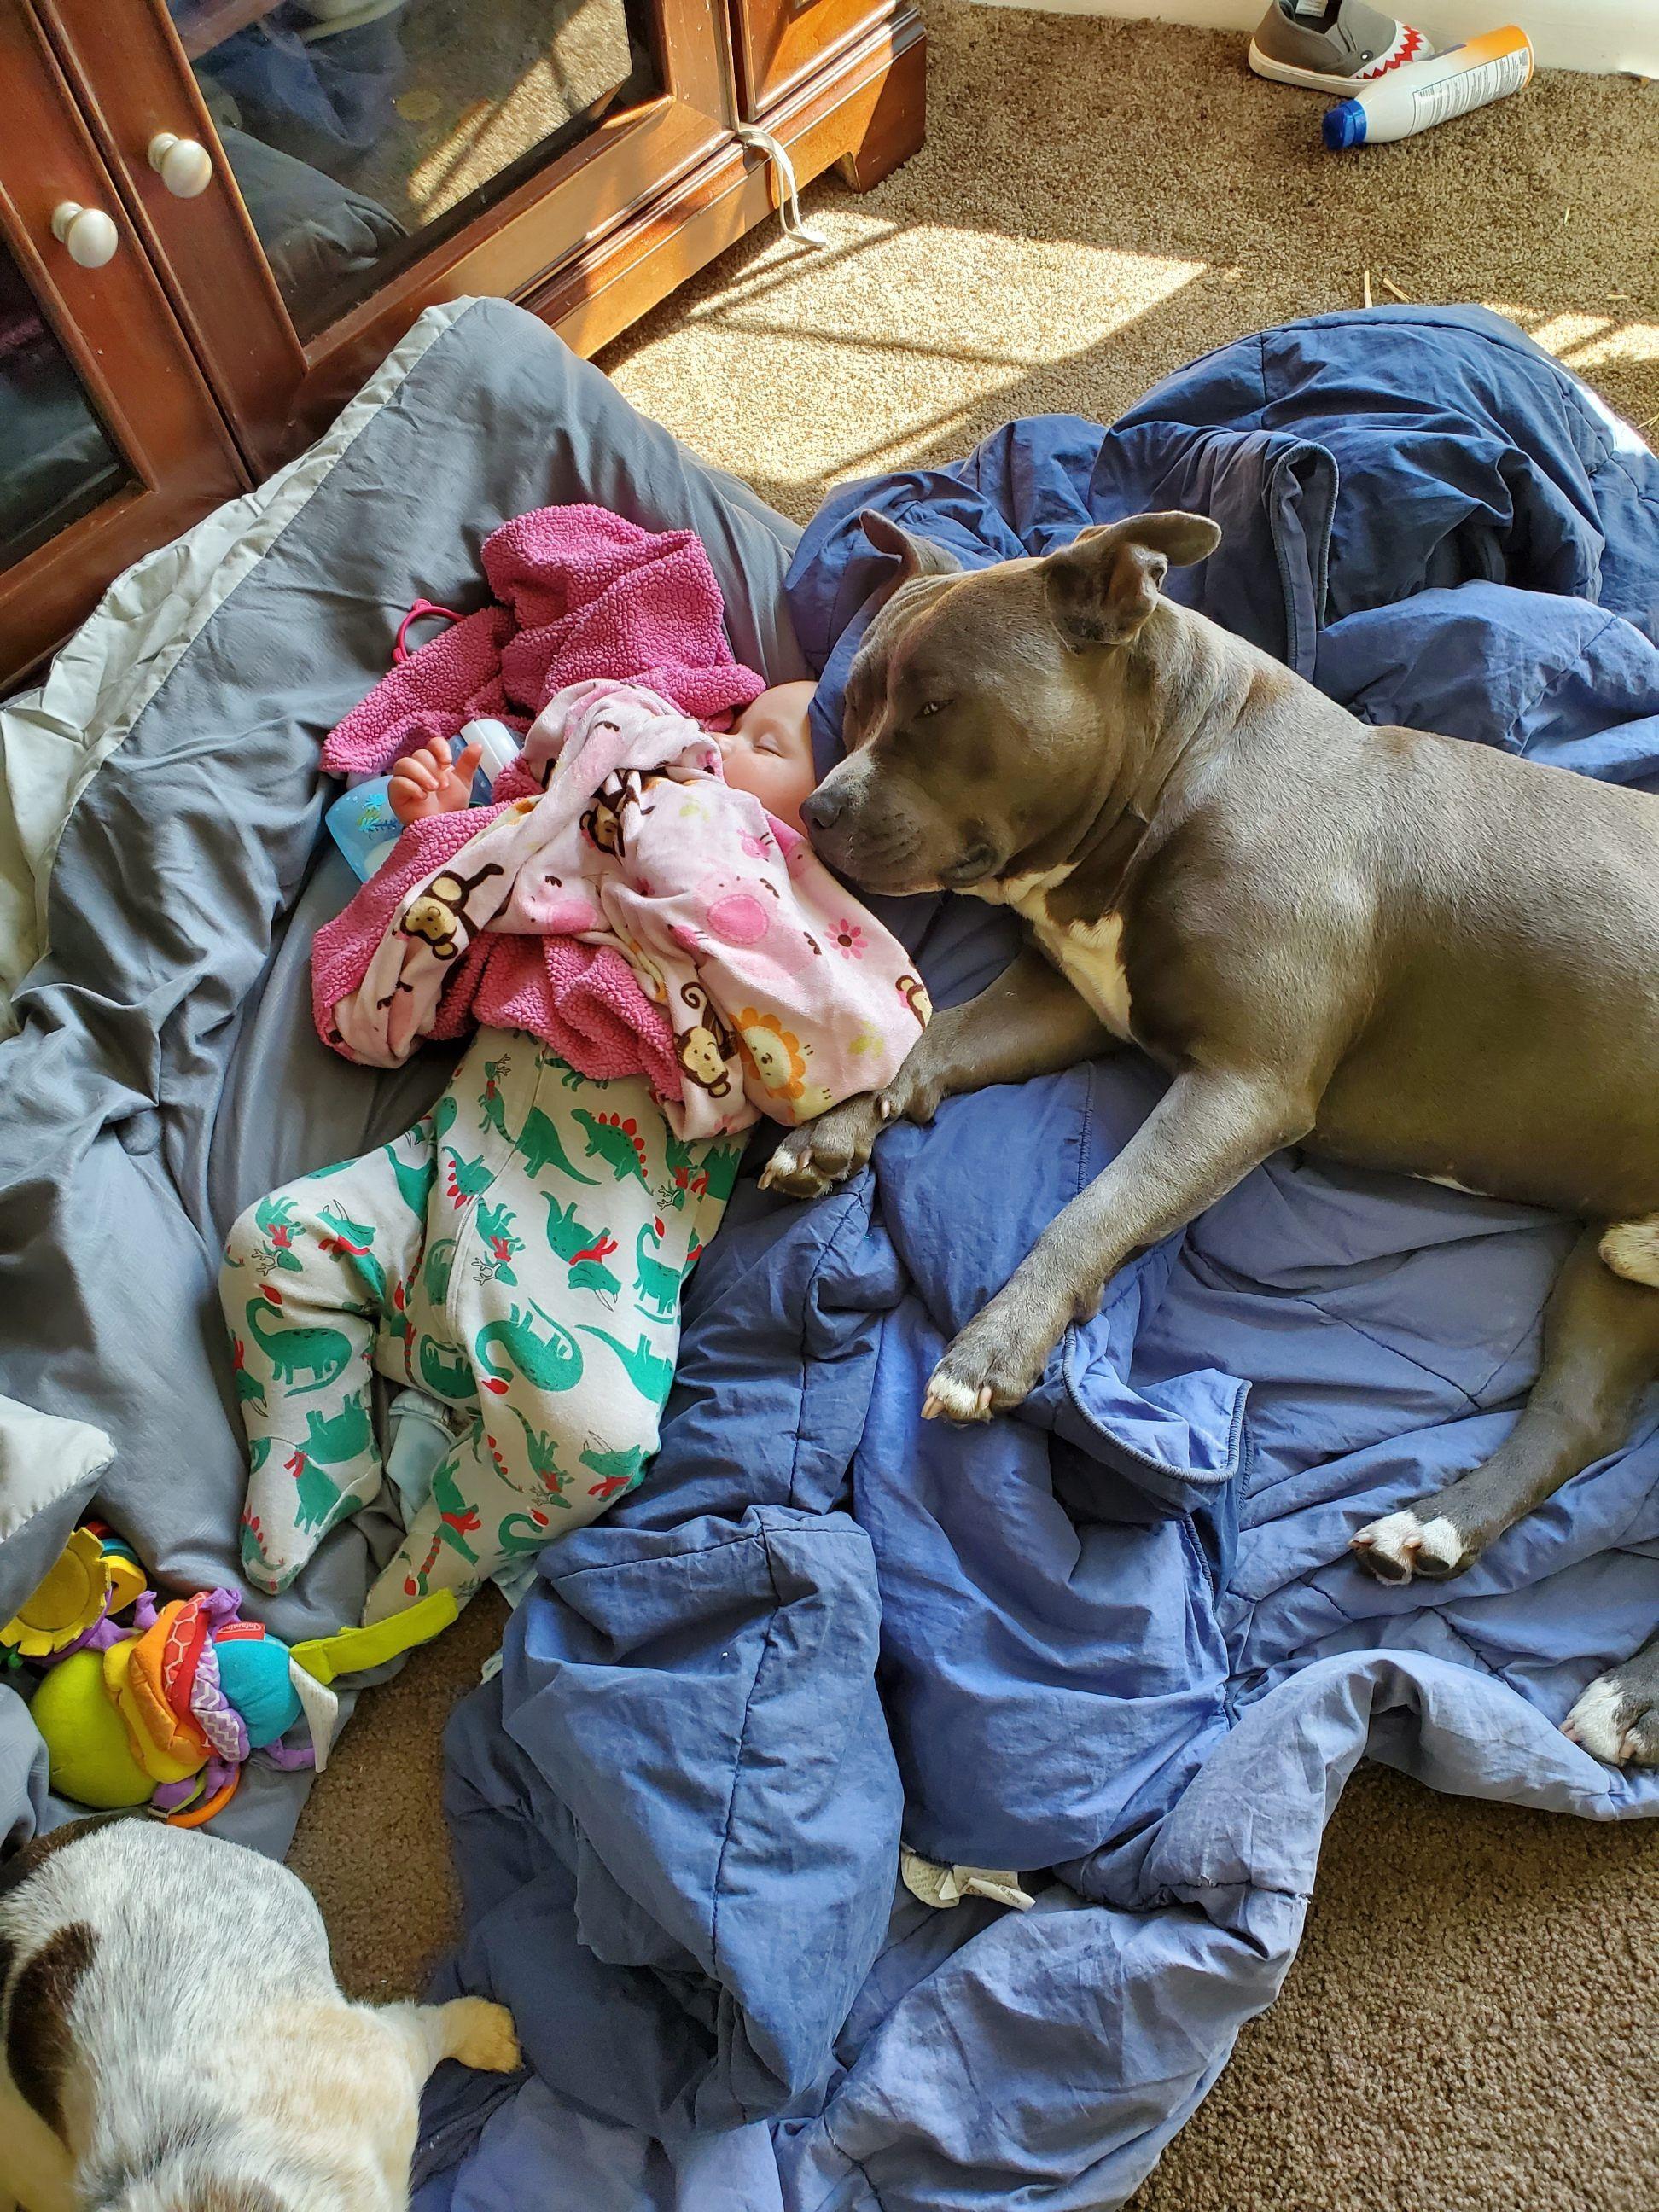 44 Adorable Pitbull Mixed Breeds In 2020 Pitbull Mix Breeds Pitbulls Cute Baby Animals